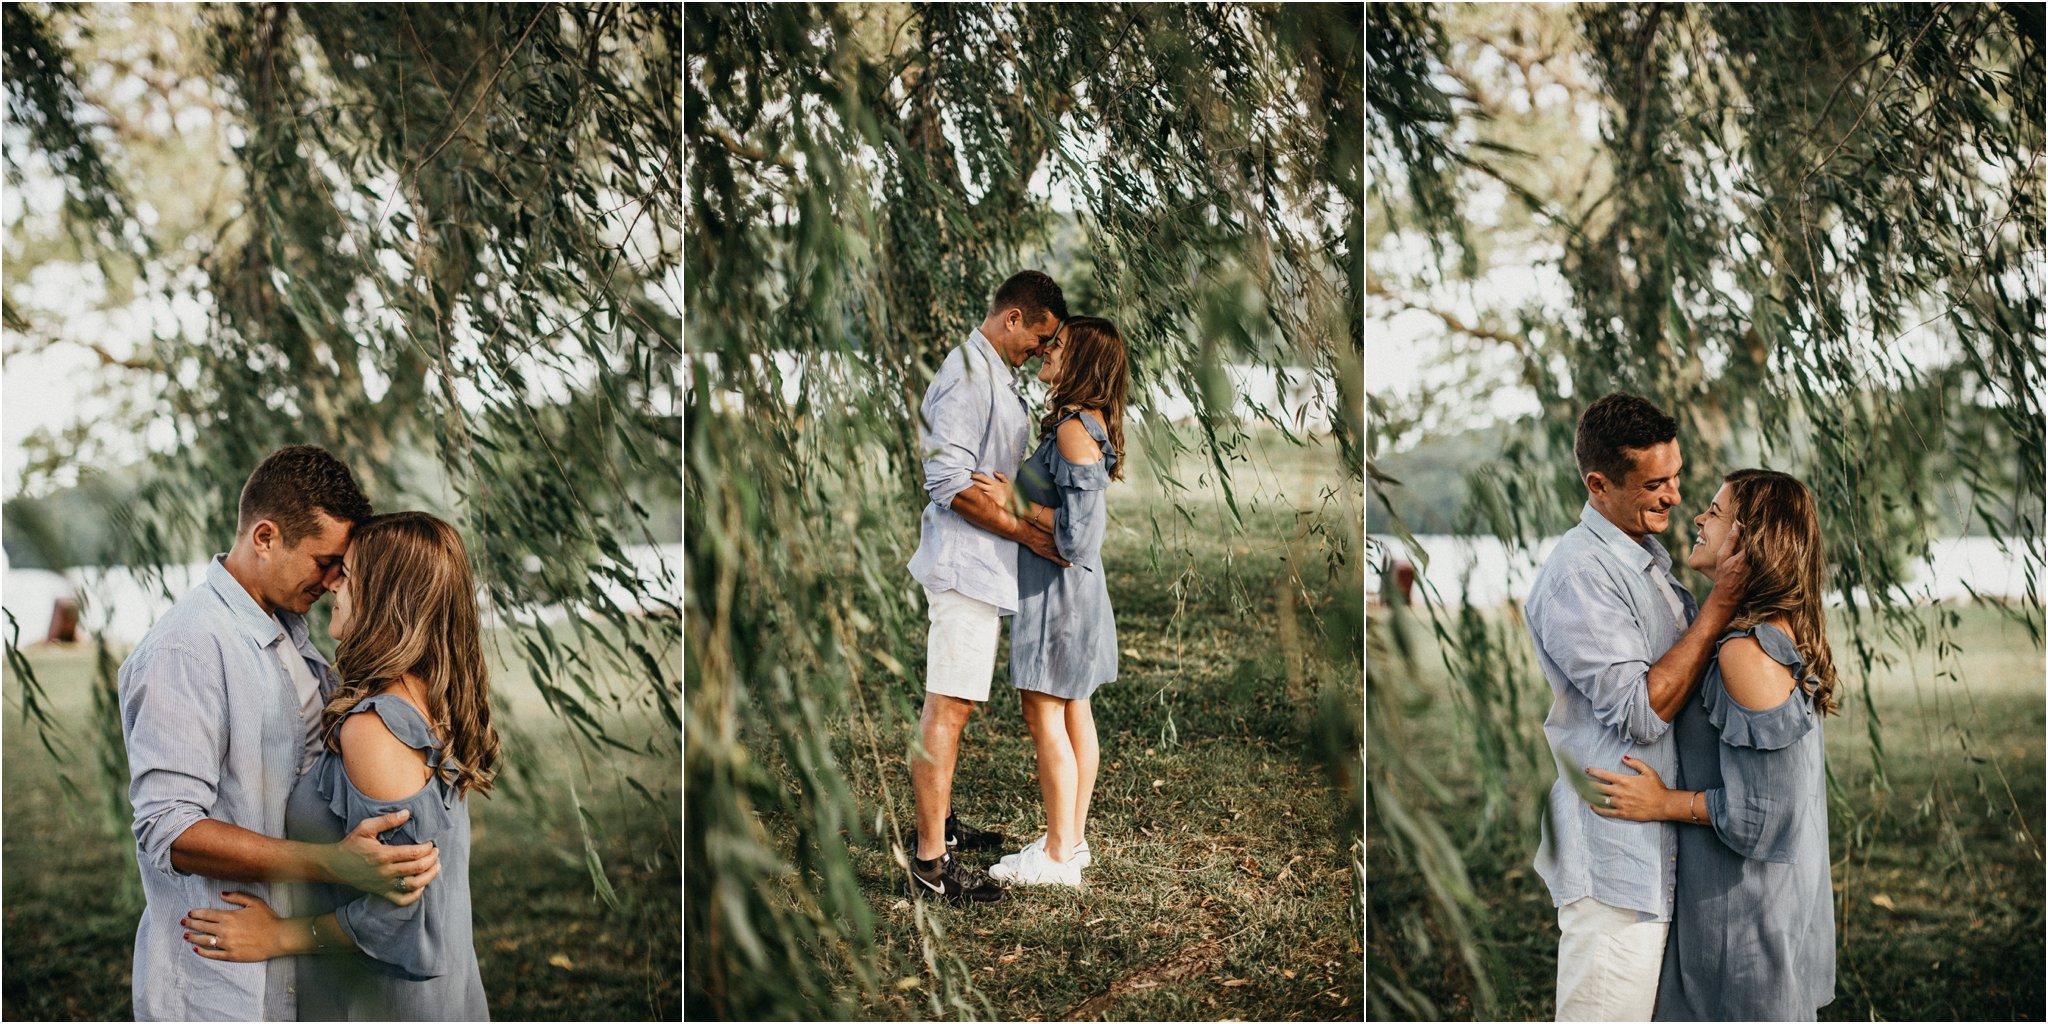 Claytor Lake State Park - Engagement portraits - Virginia wedding photographer - Pat Cori Photography-12.jpg